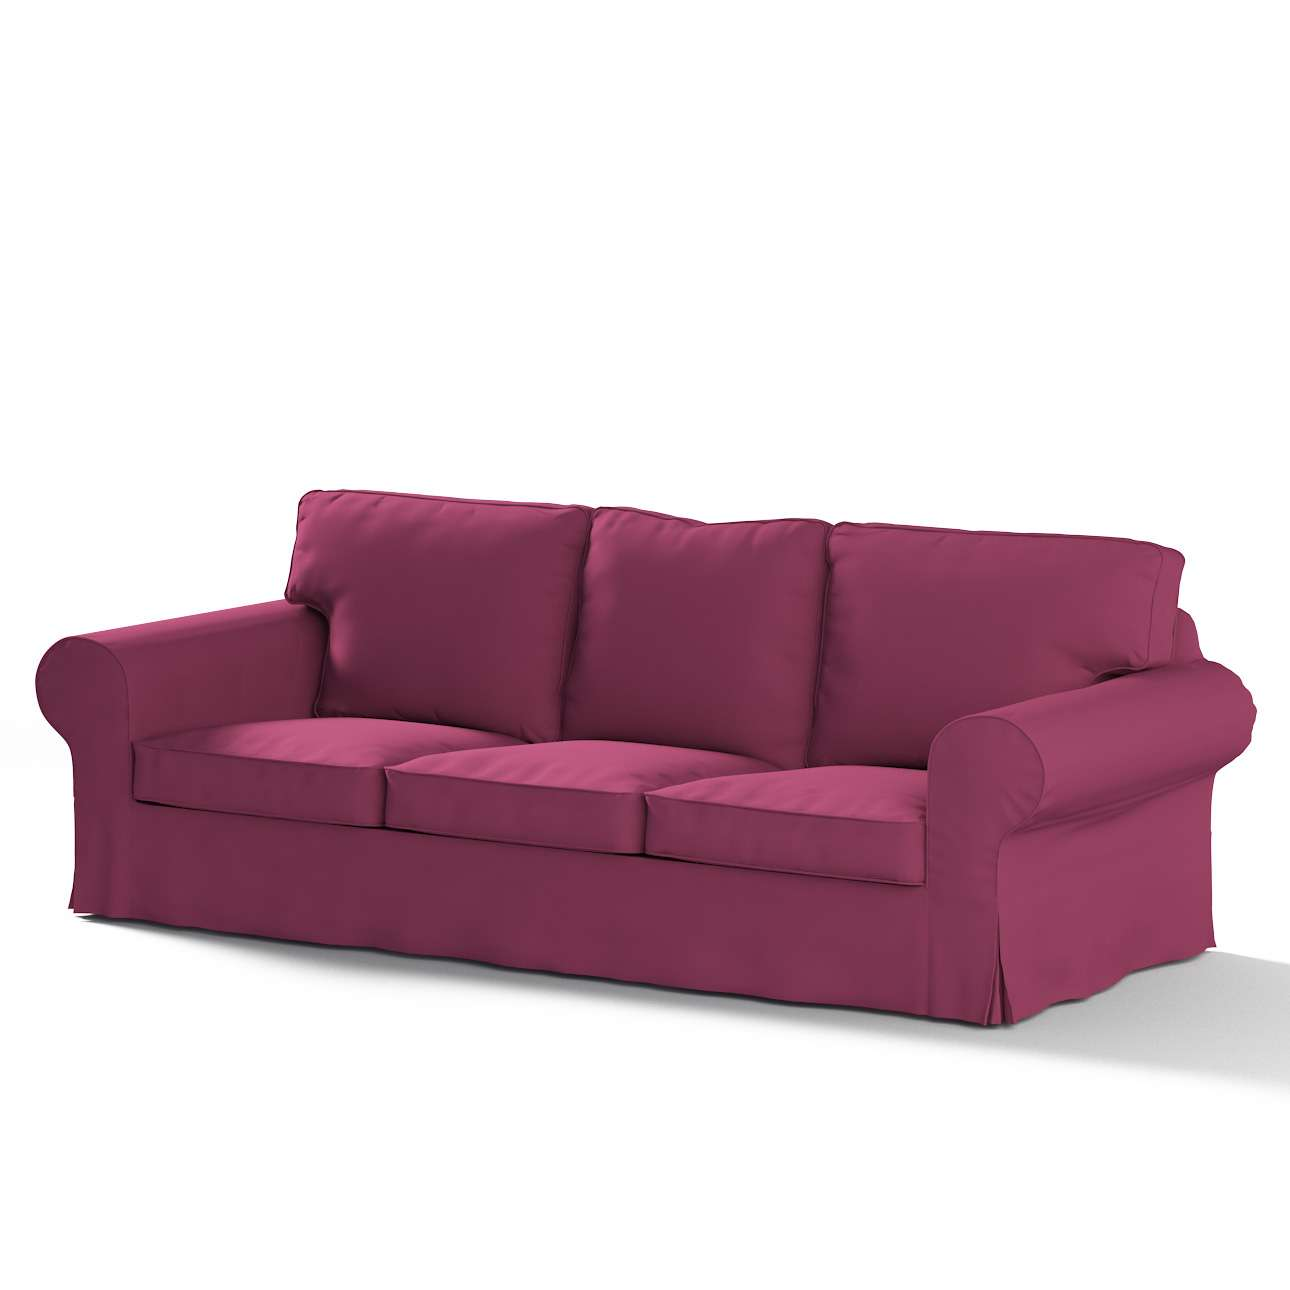 Ektorp 3-Sitzer Schlafsofabezug, ALTES Modell Sofahusse Ektorp 3-Sitzer Schlafsofa von der Kollektion Cotton Panama, Stoff: 702-32